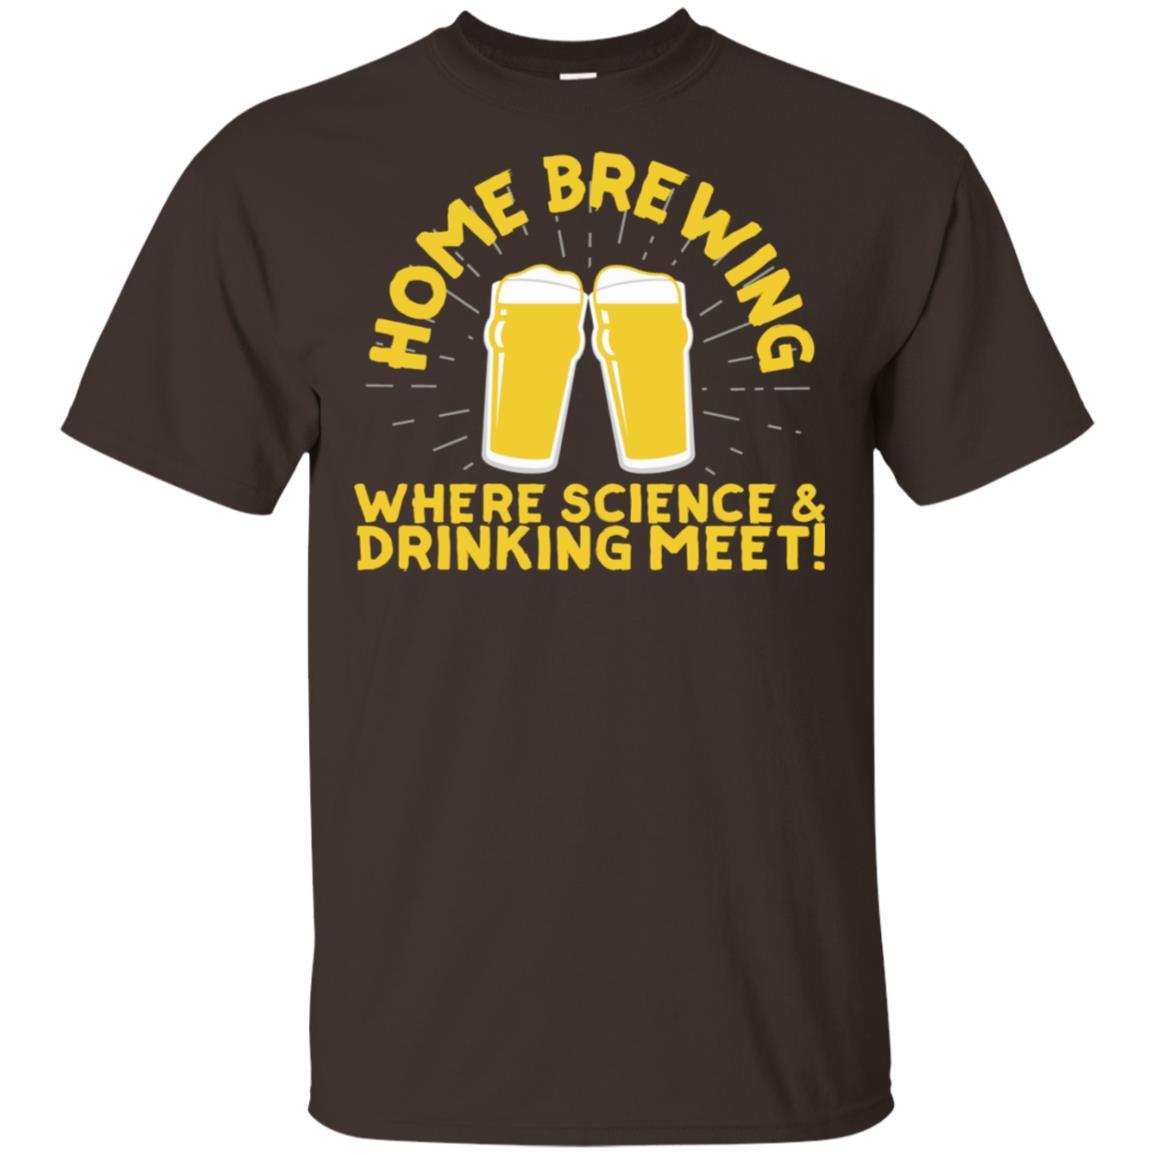 Home Brewing Science & Drinking Meet Unisex Short Sleeve